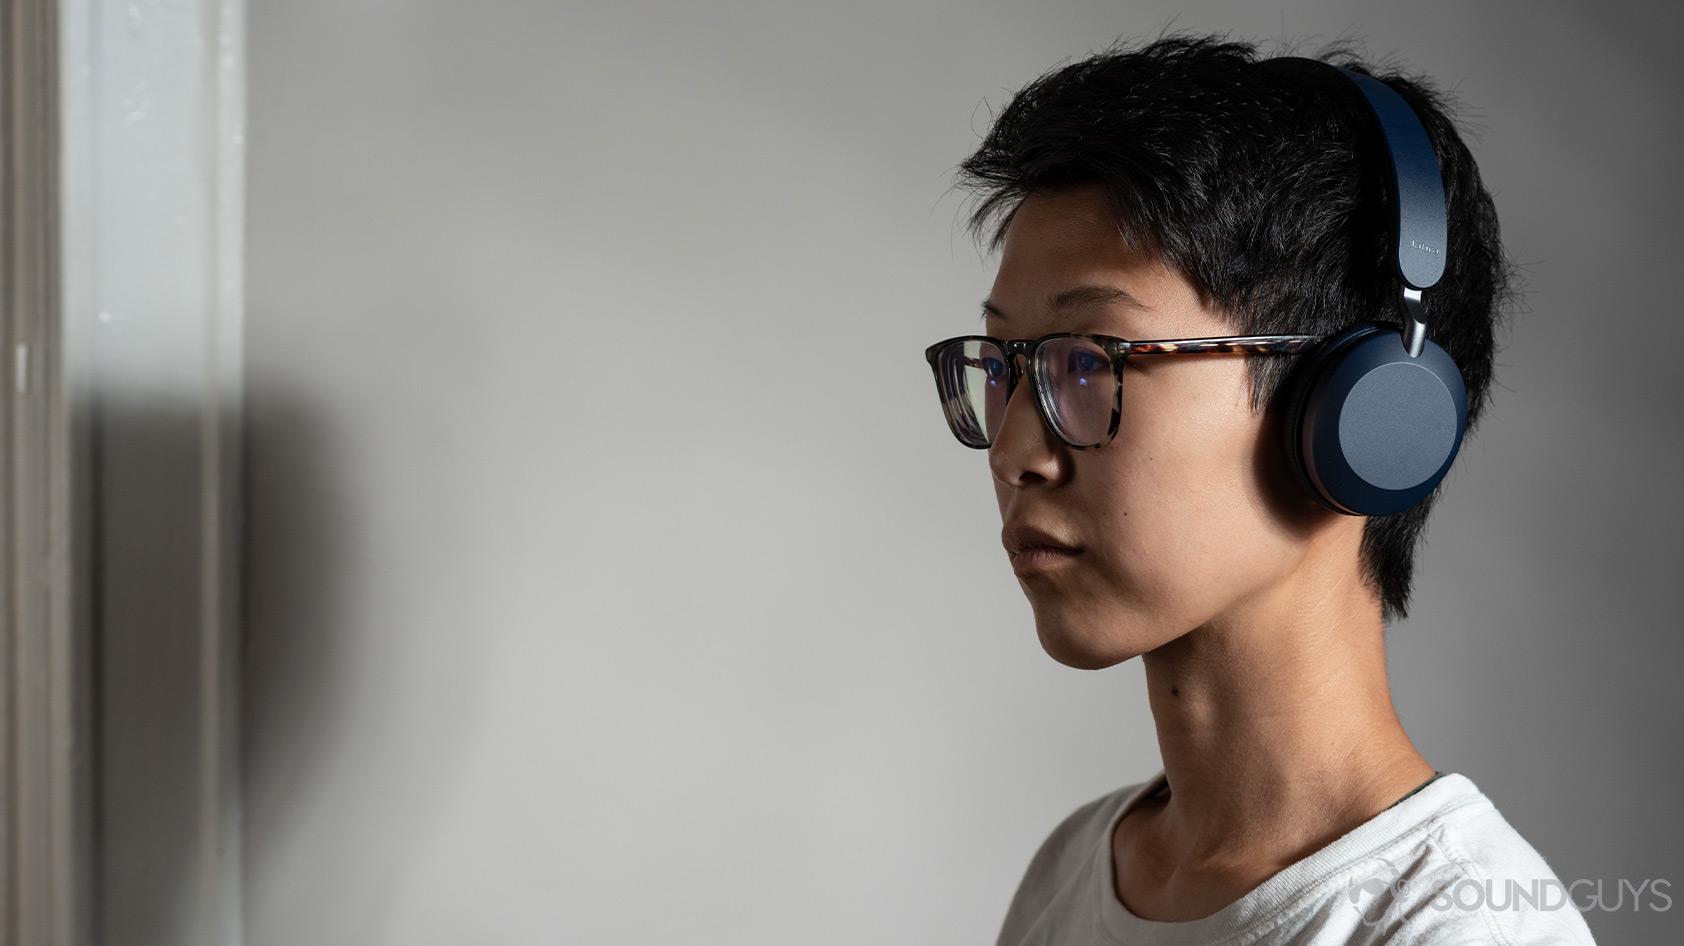 Best Affordable On Ear Headphones